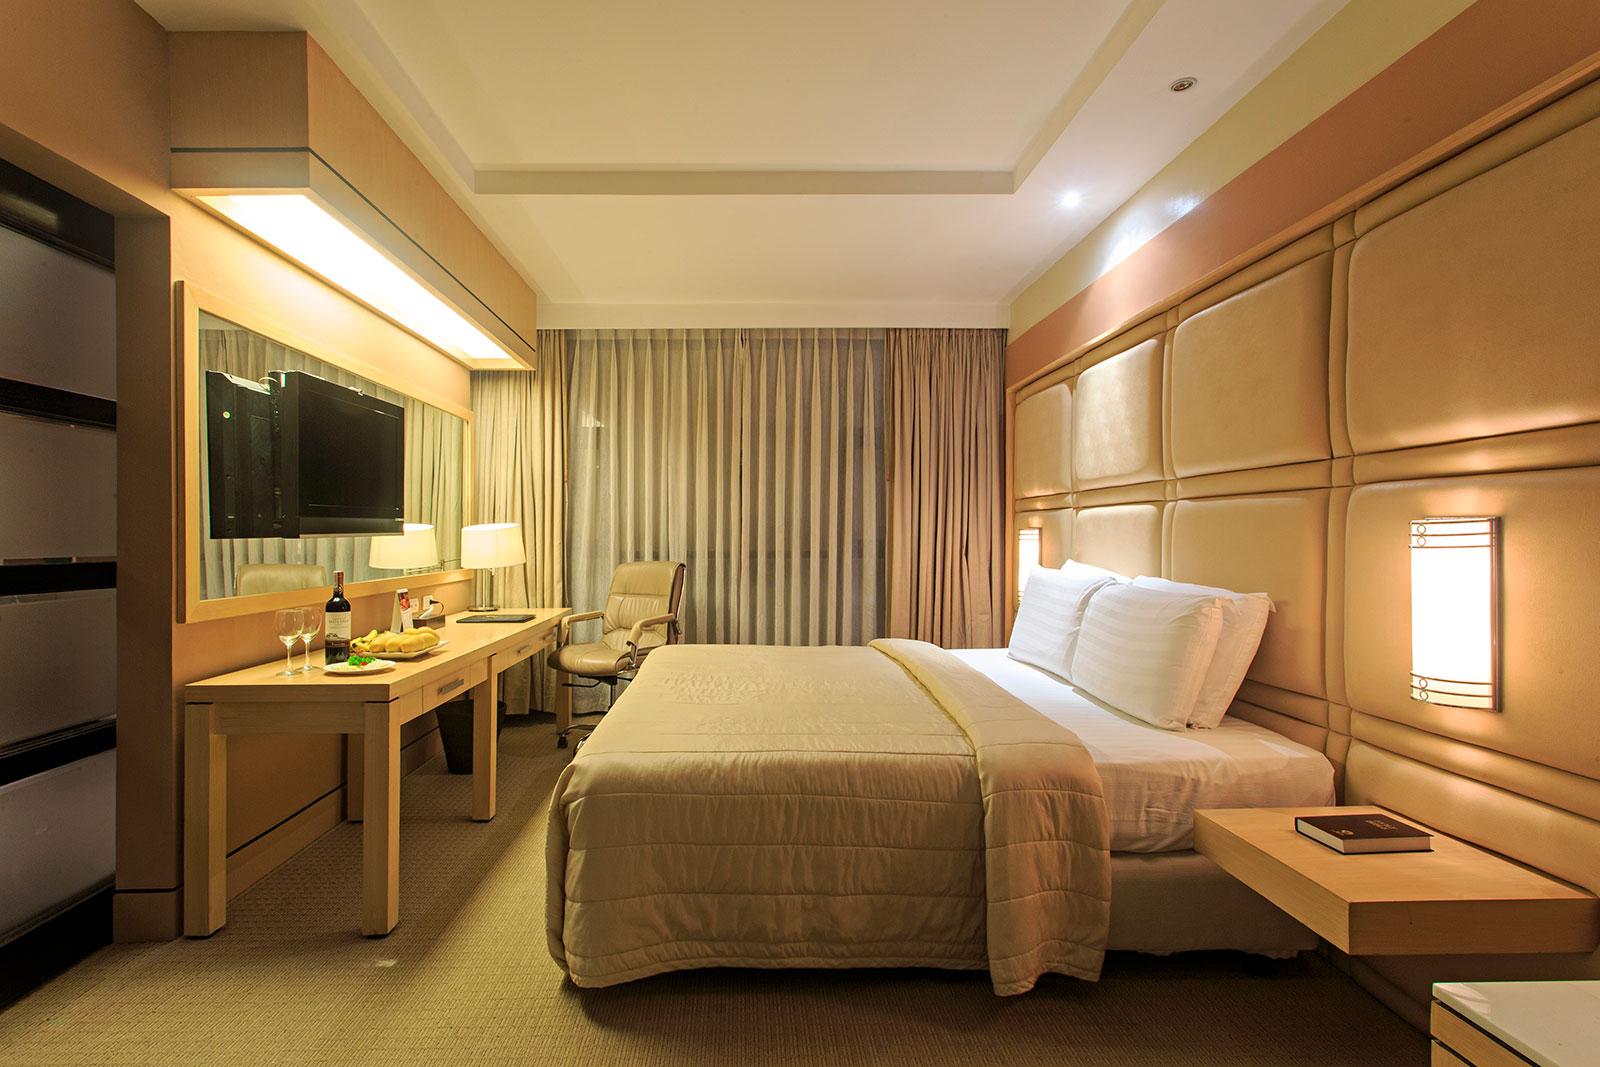 Rental Car Philippines >> Cebu Parklane International Hotel | Metro Cebu